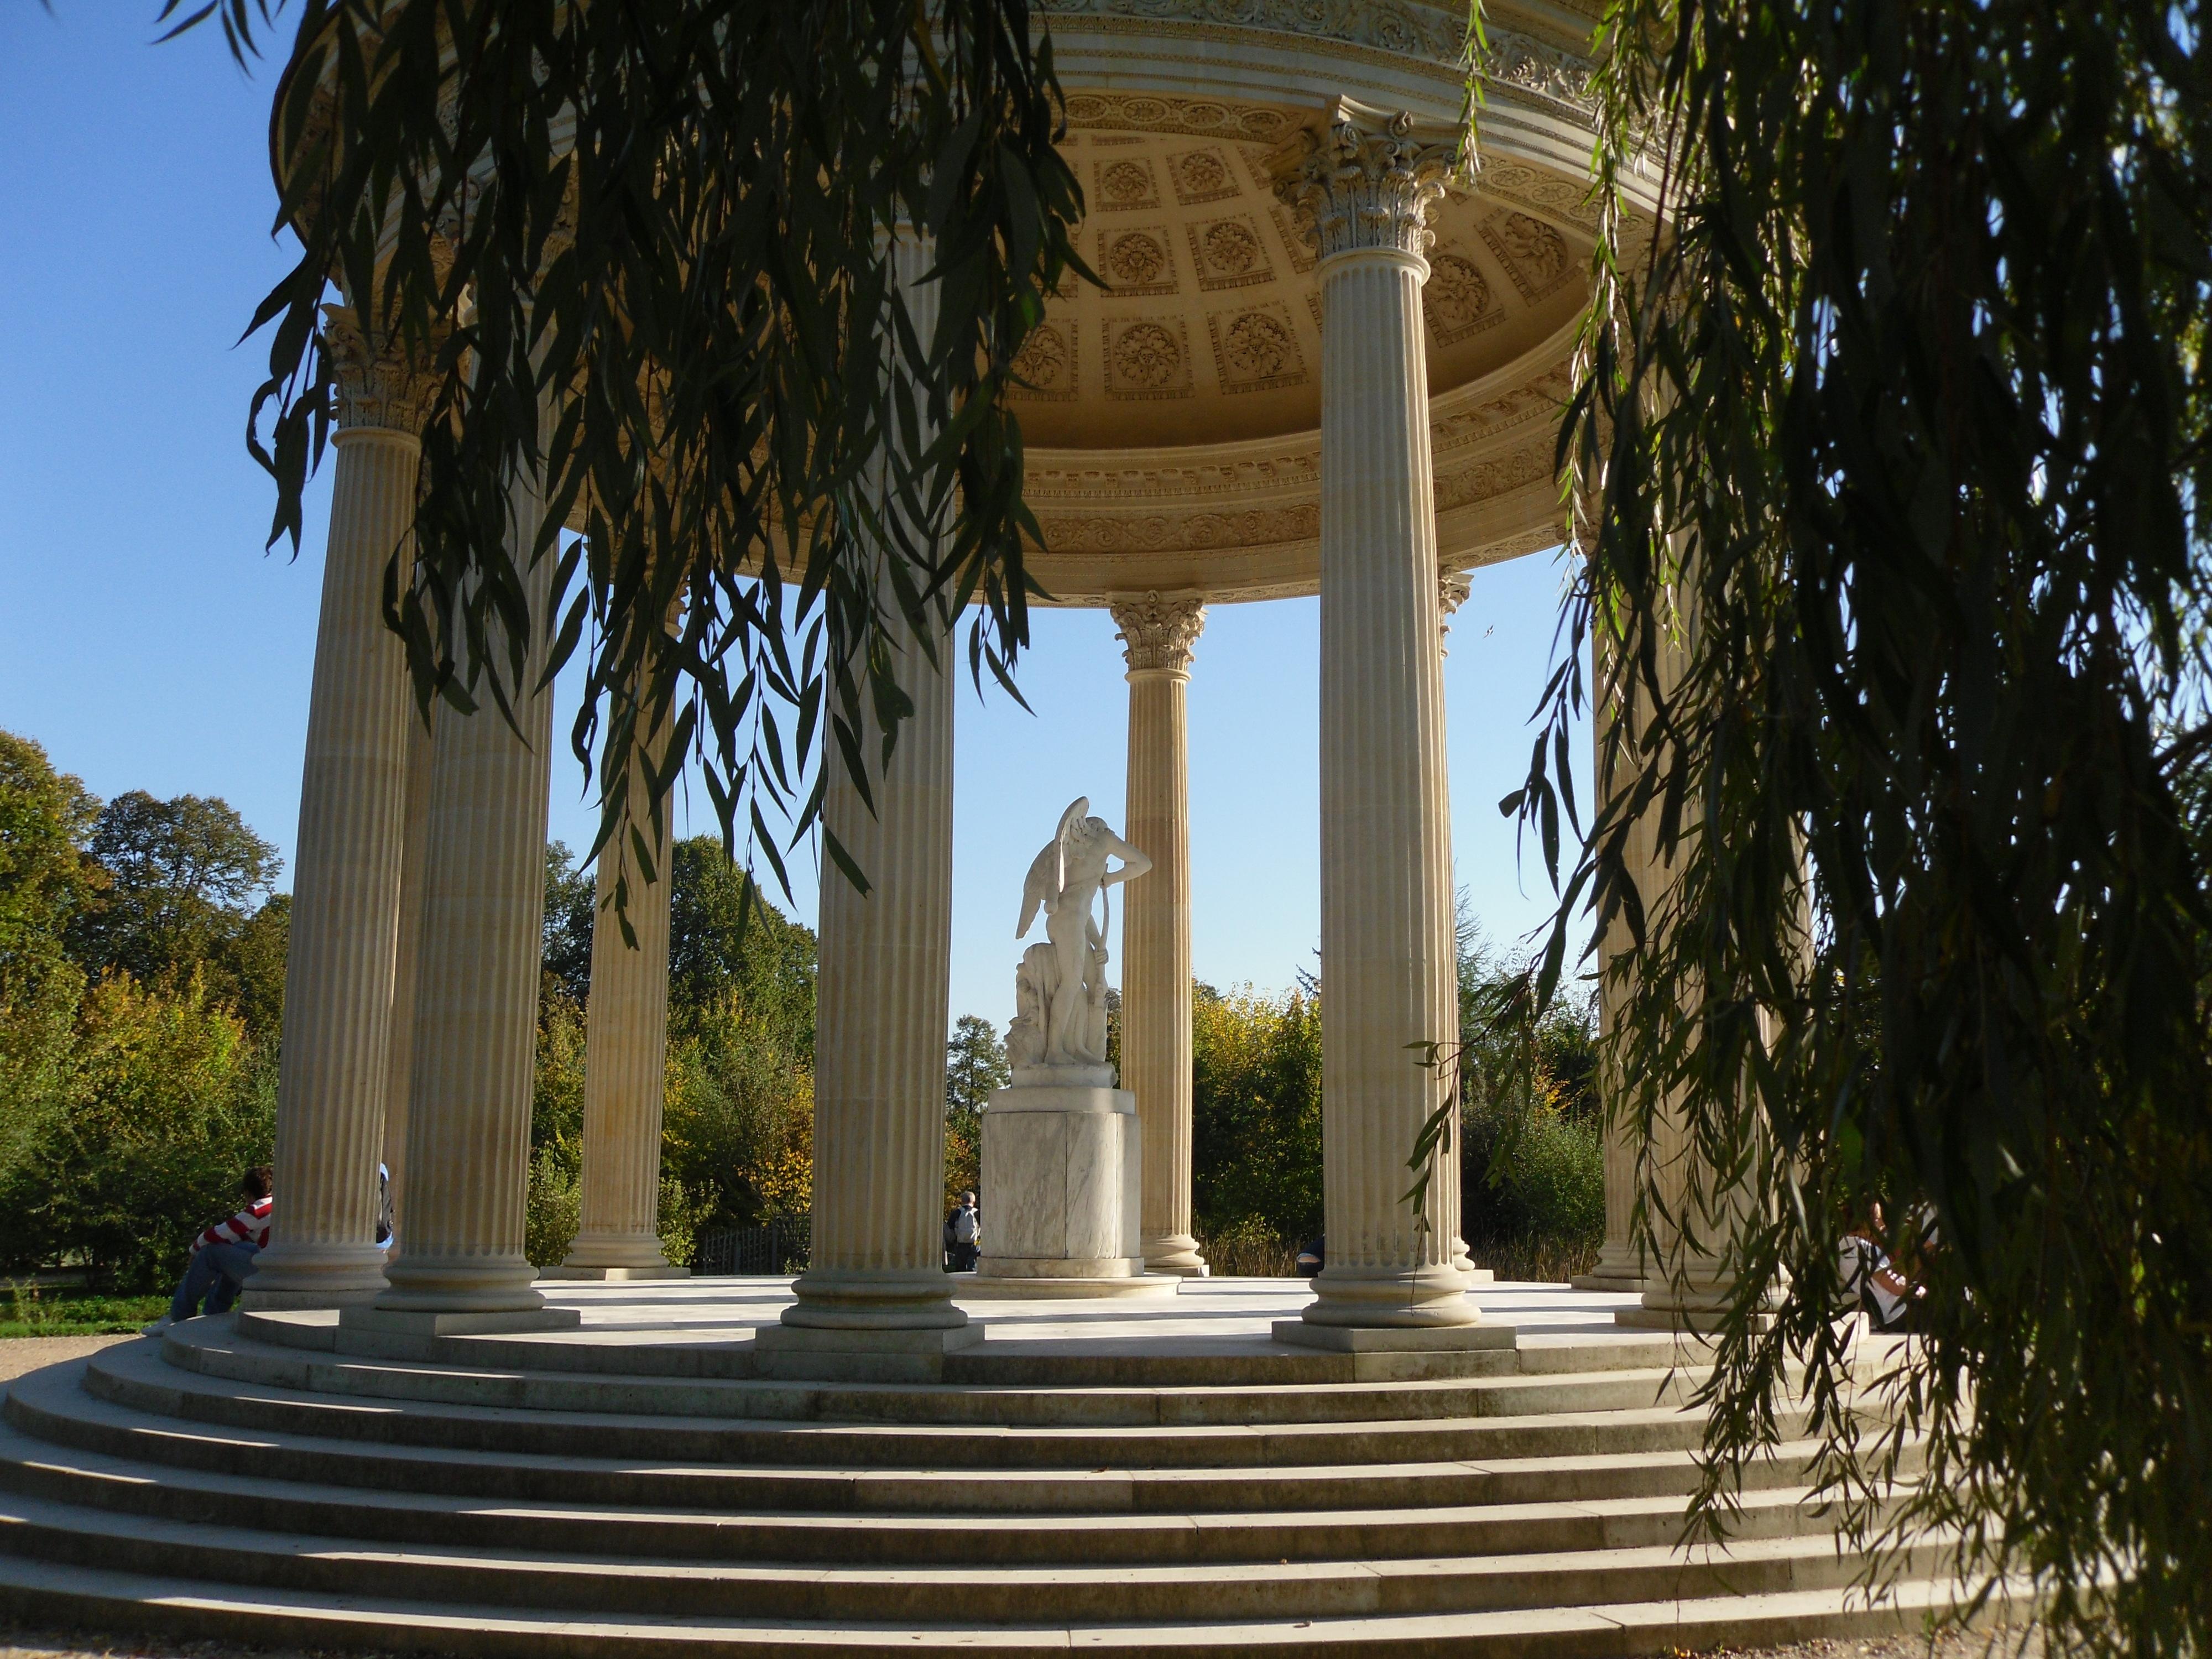 A Tour Through The Gardens Of Versailles Work In Progress